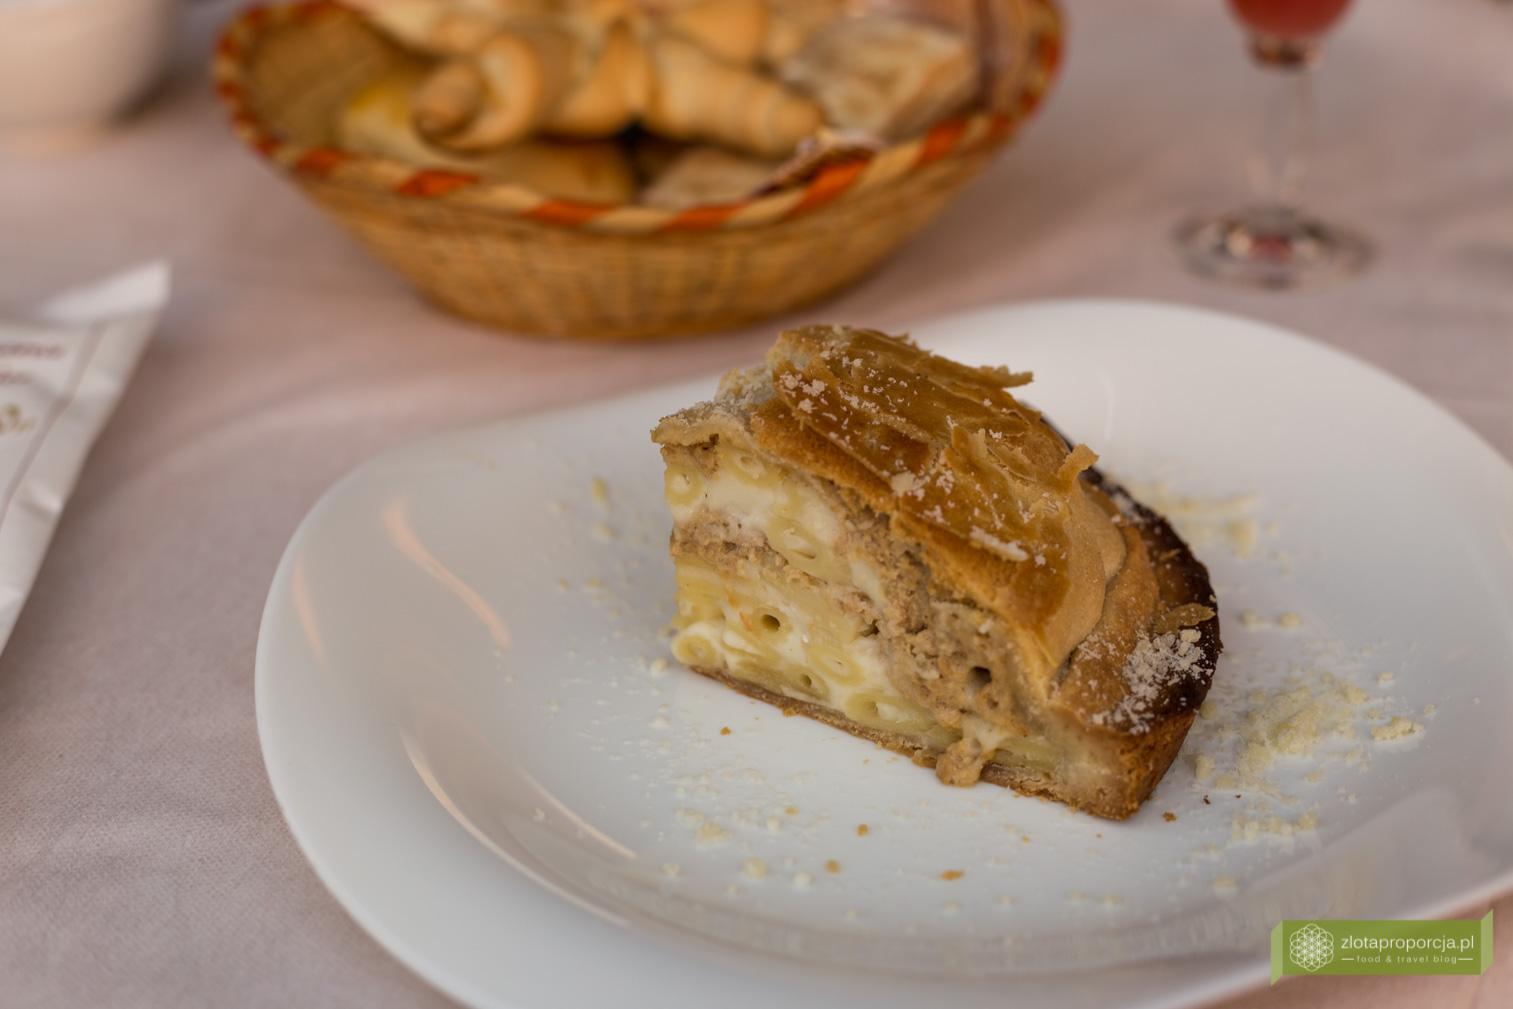 Pasticcio ferrarese, Ferrara, Emilia Romania, kuchnia Ferrary, co zjeść w Ferrarze, co zjeść w Emilii Romanii